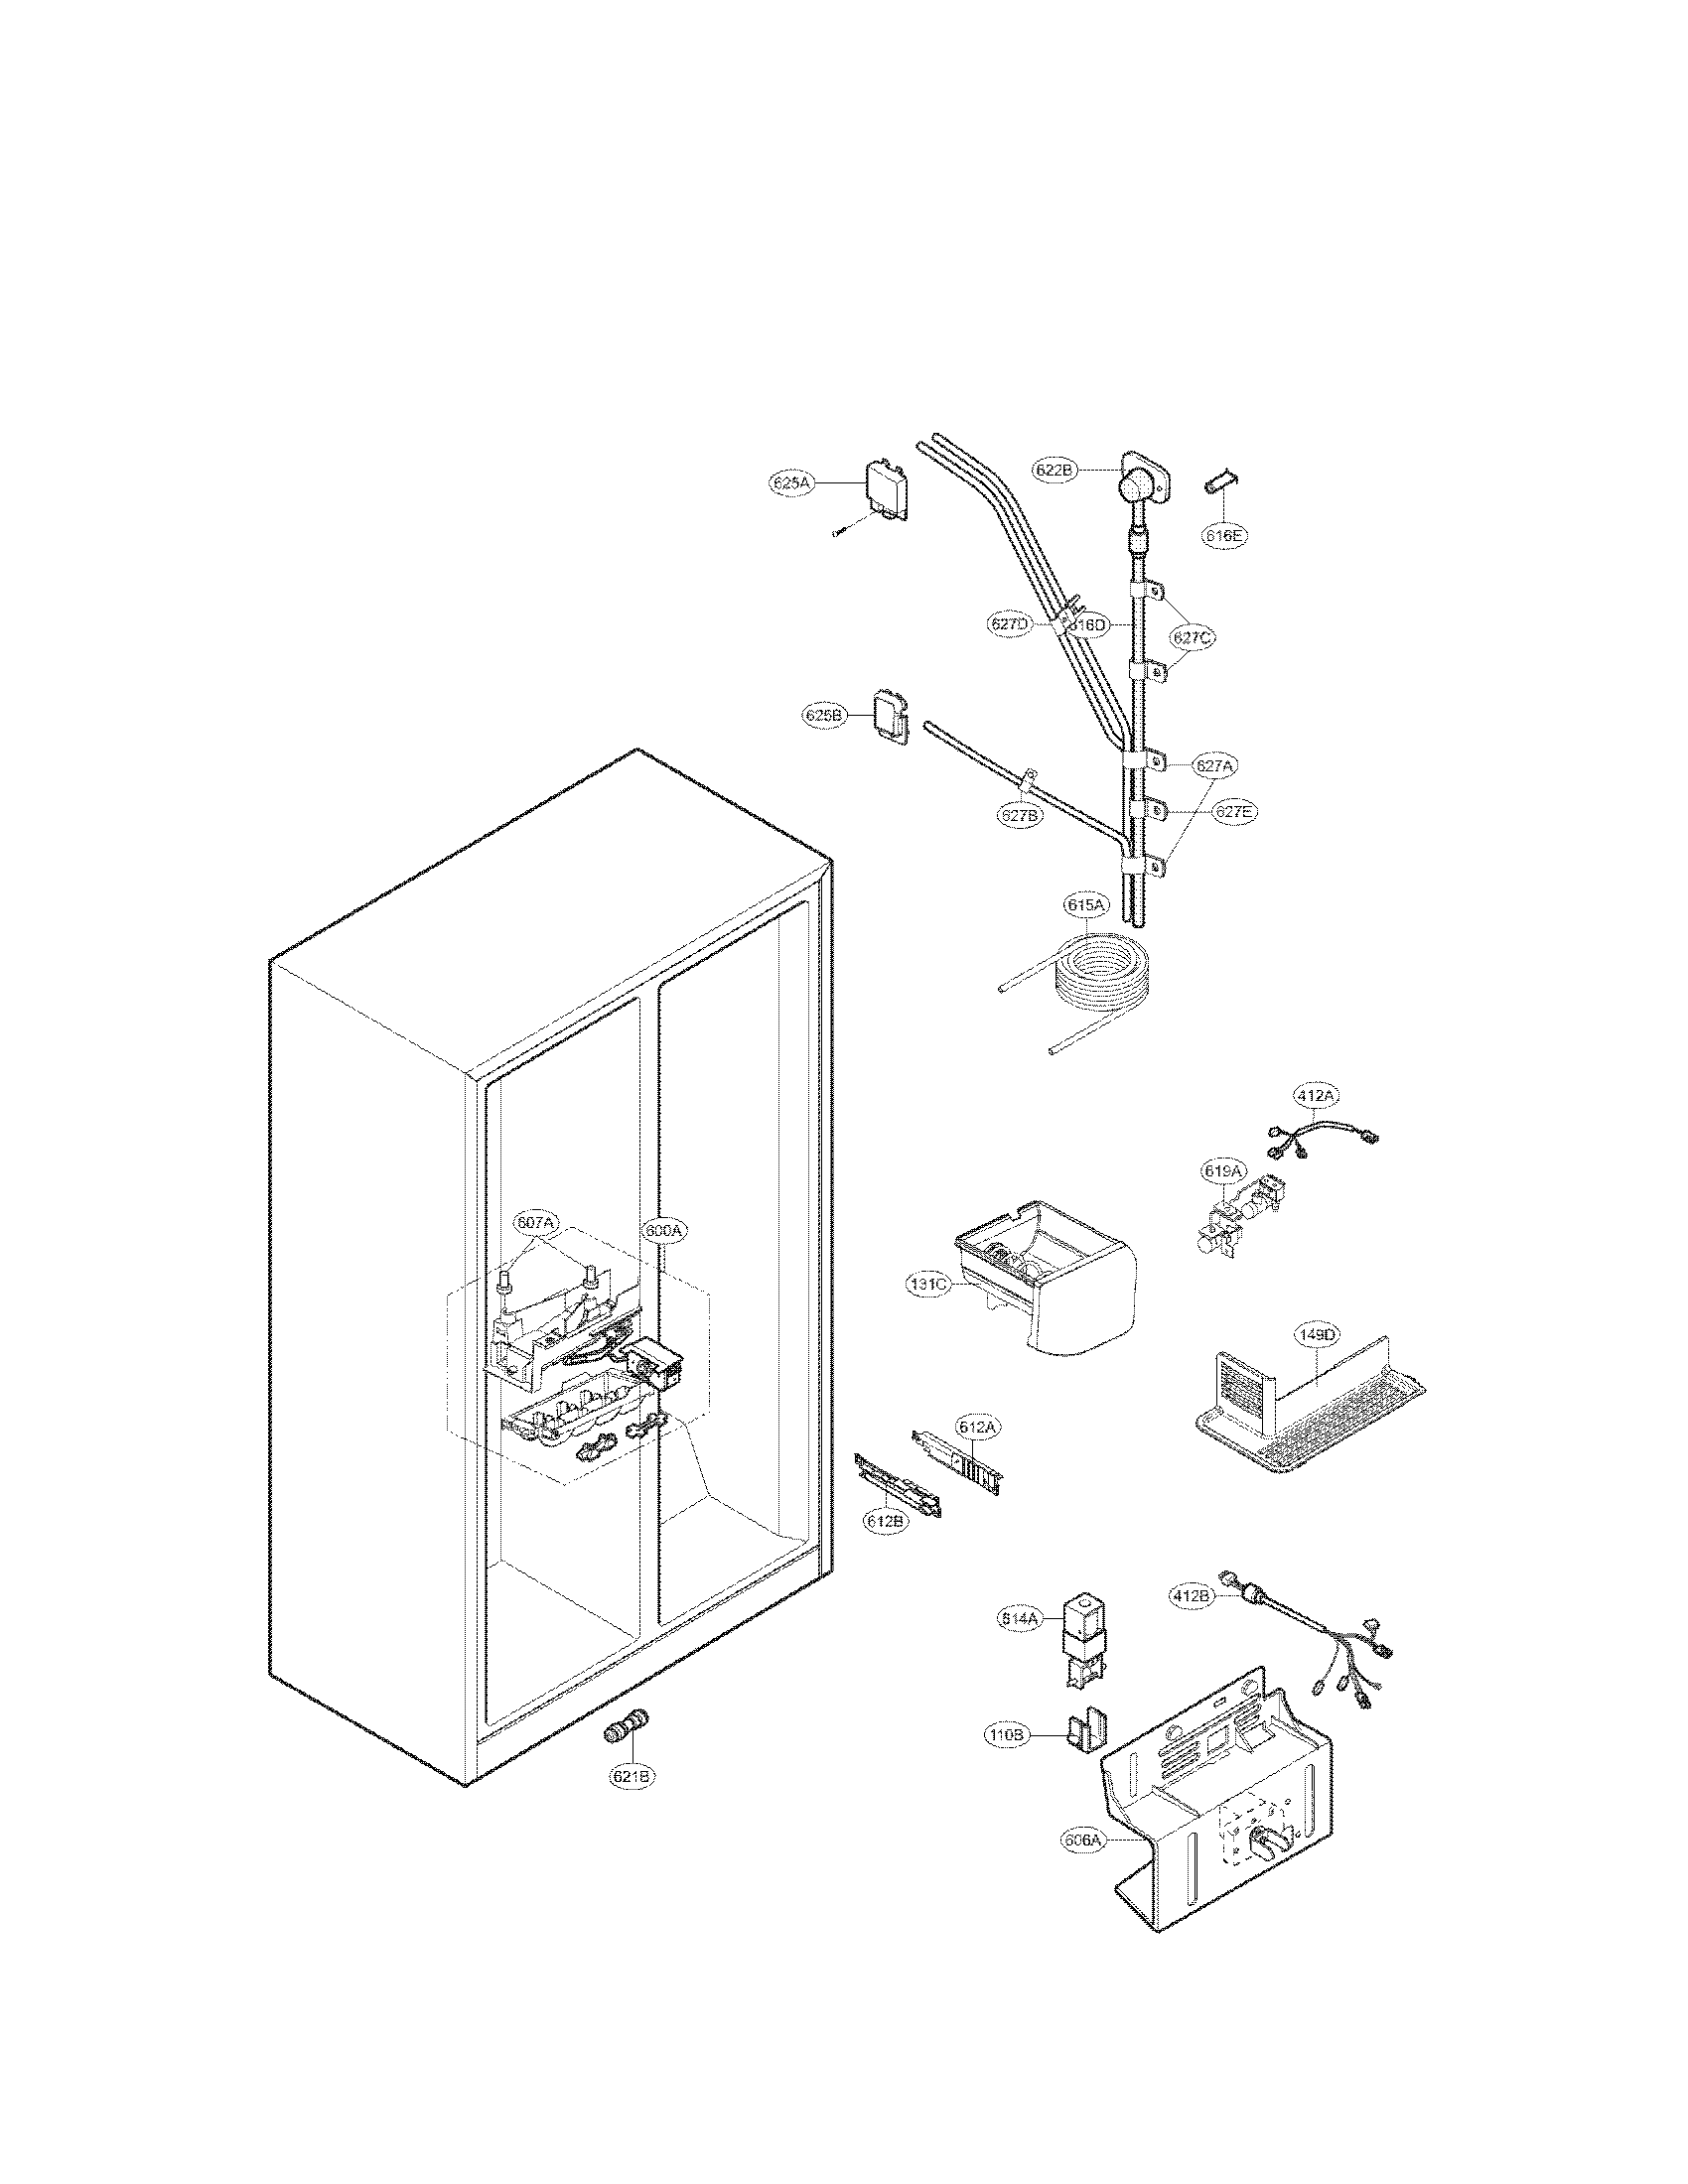 Kenmore model 79551312014 side-by-side refrigerator